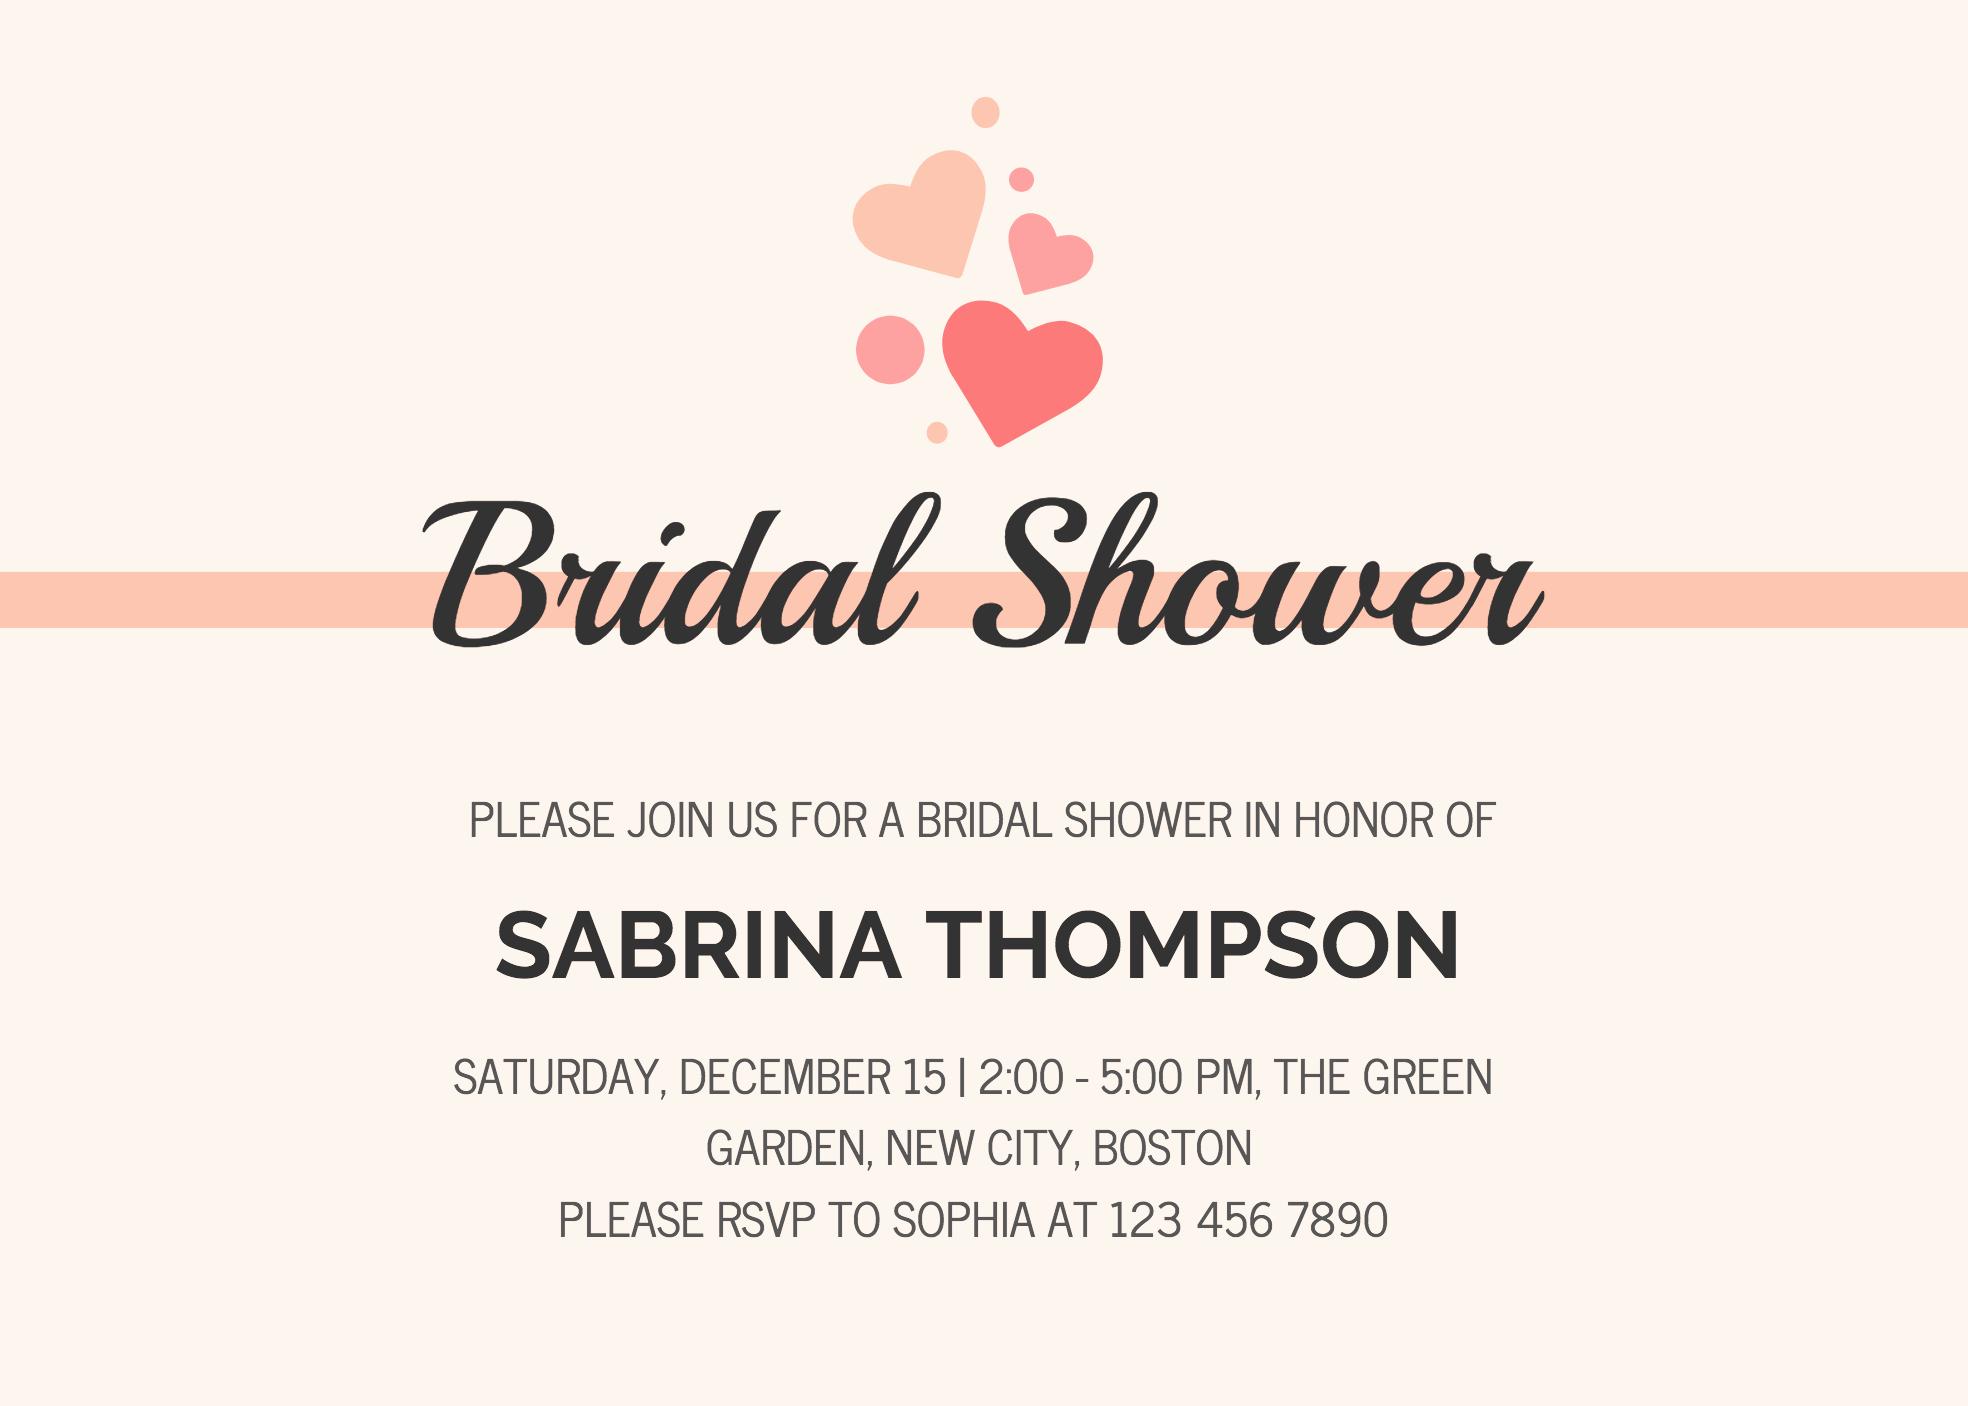 Bridal Shower Invite Template Fresh 19 Diy Bridal Shower and Wedding Invitation Templates